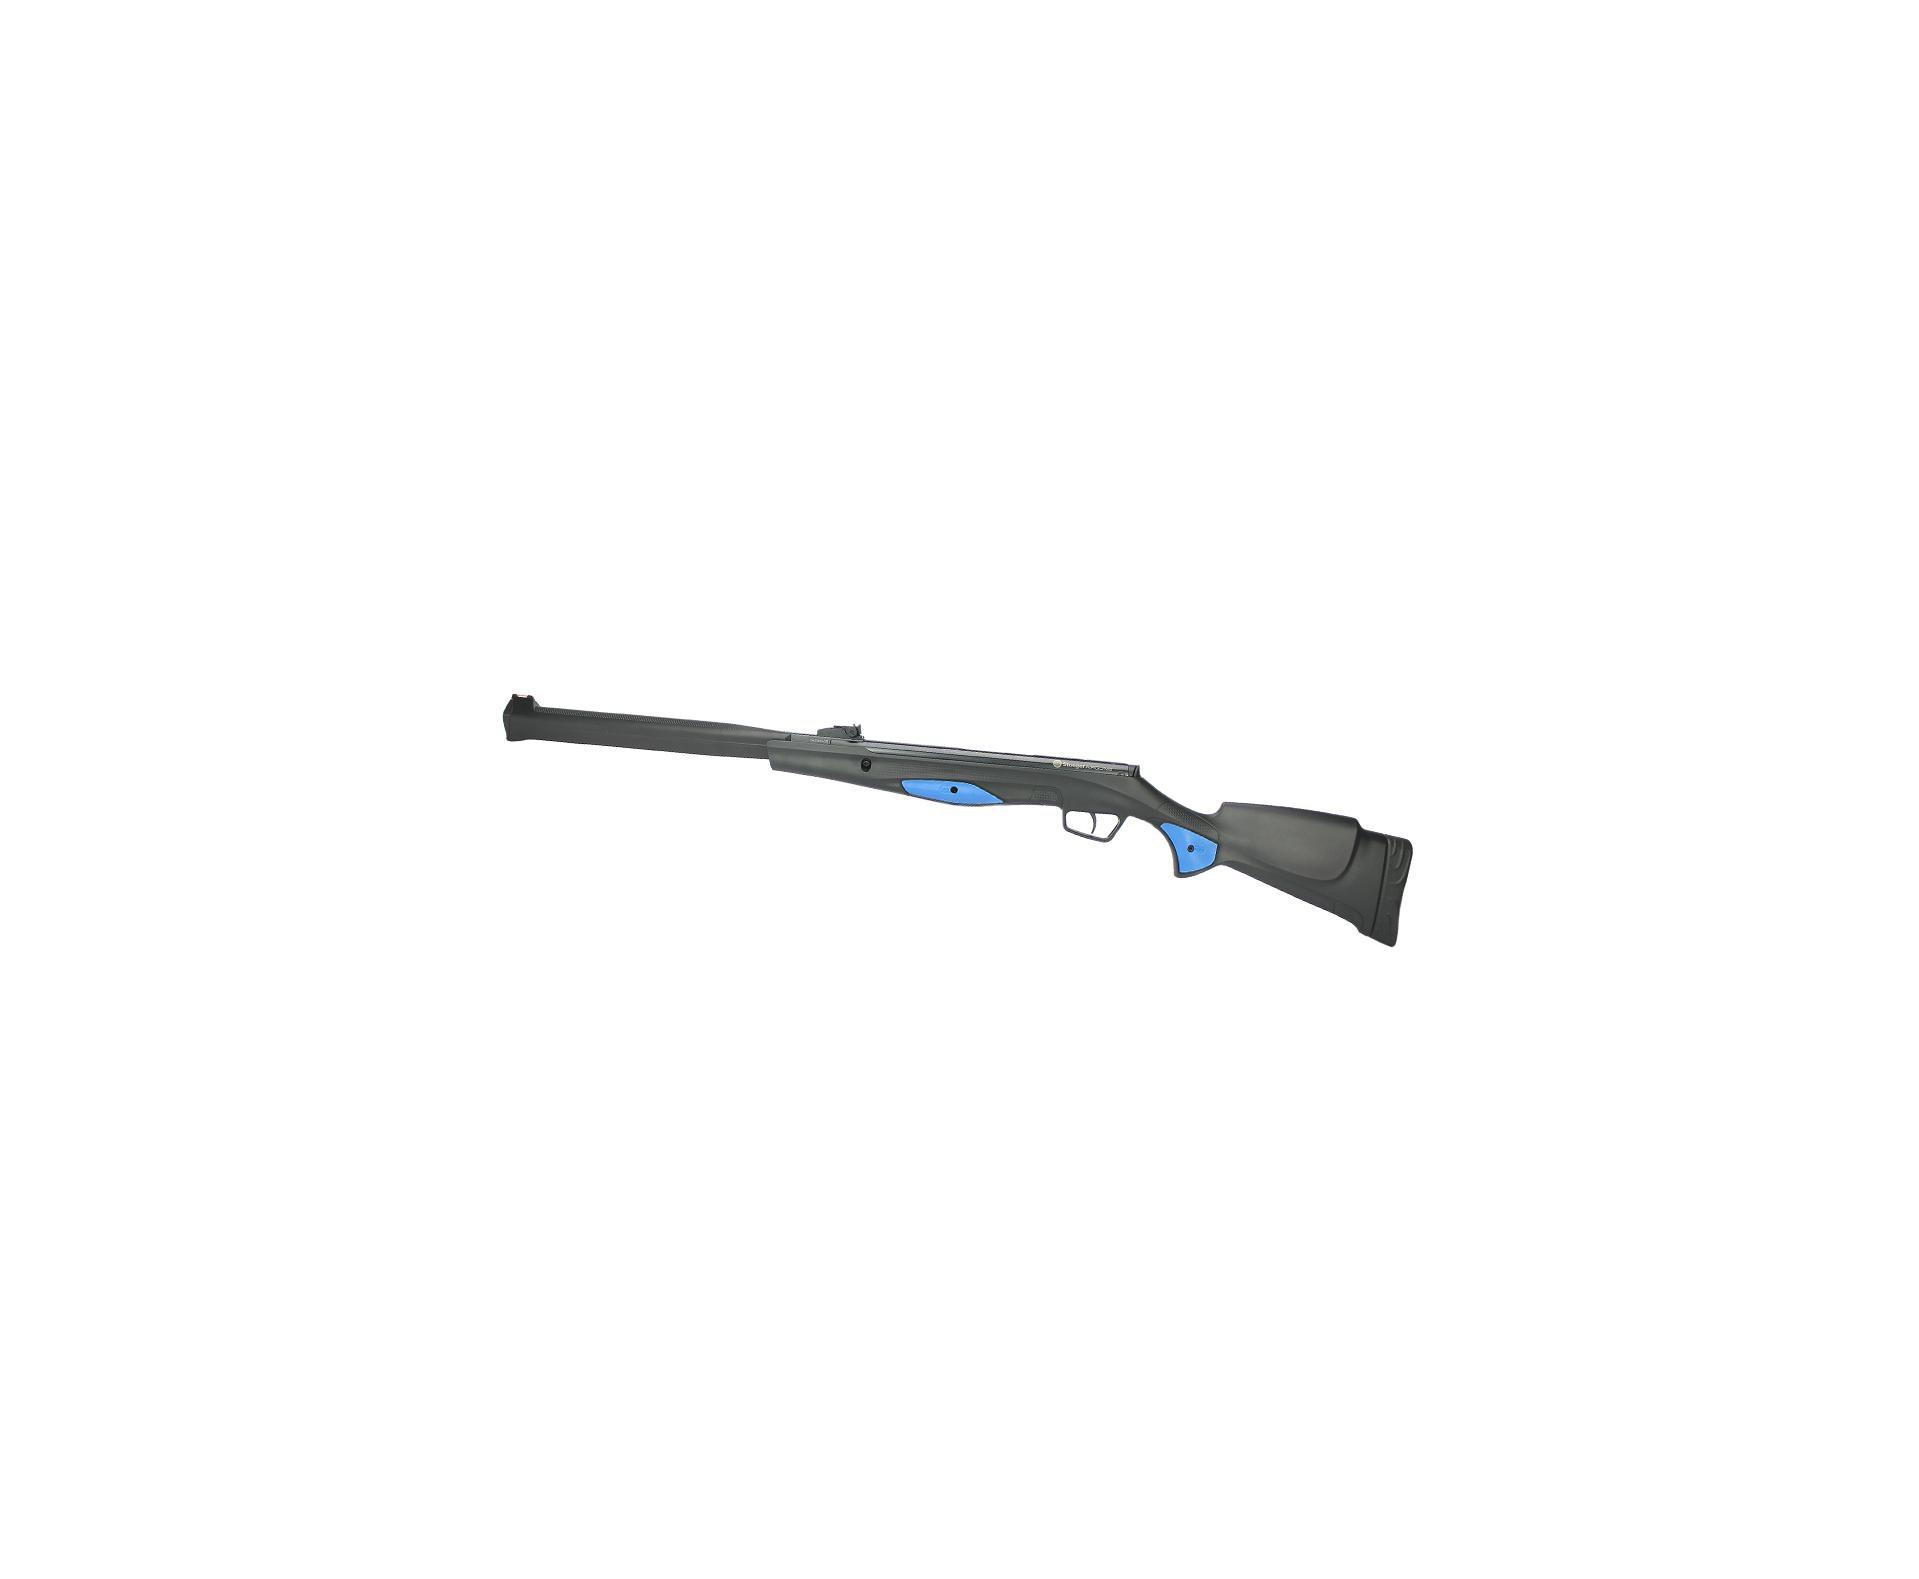 Carabina De Pressão Stoeger Rx20 Nitro S3 Supressor 5.5mm Beretta - Fxr